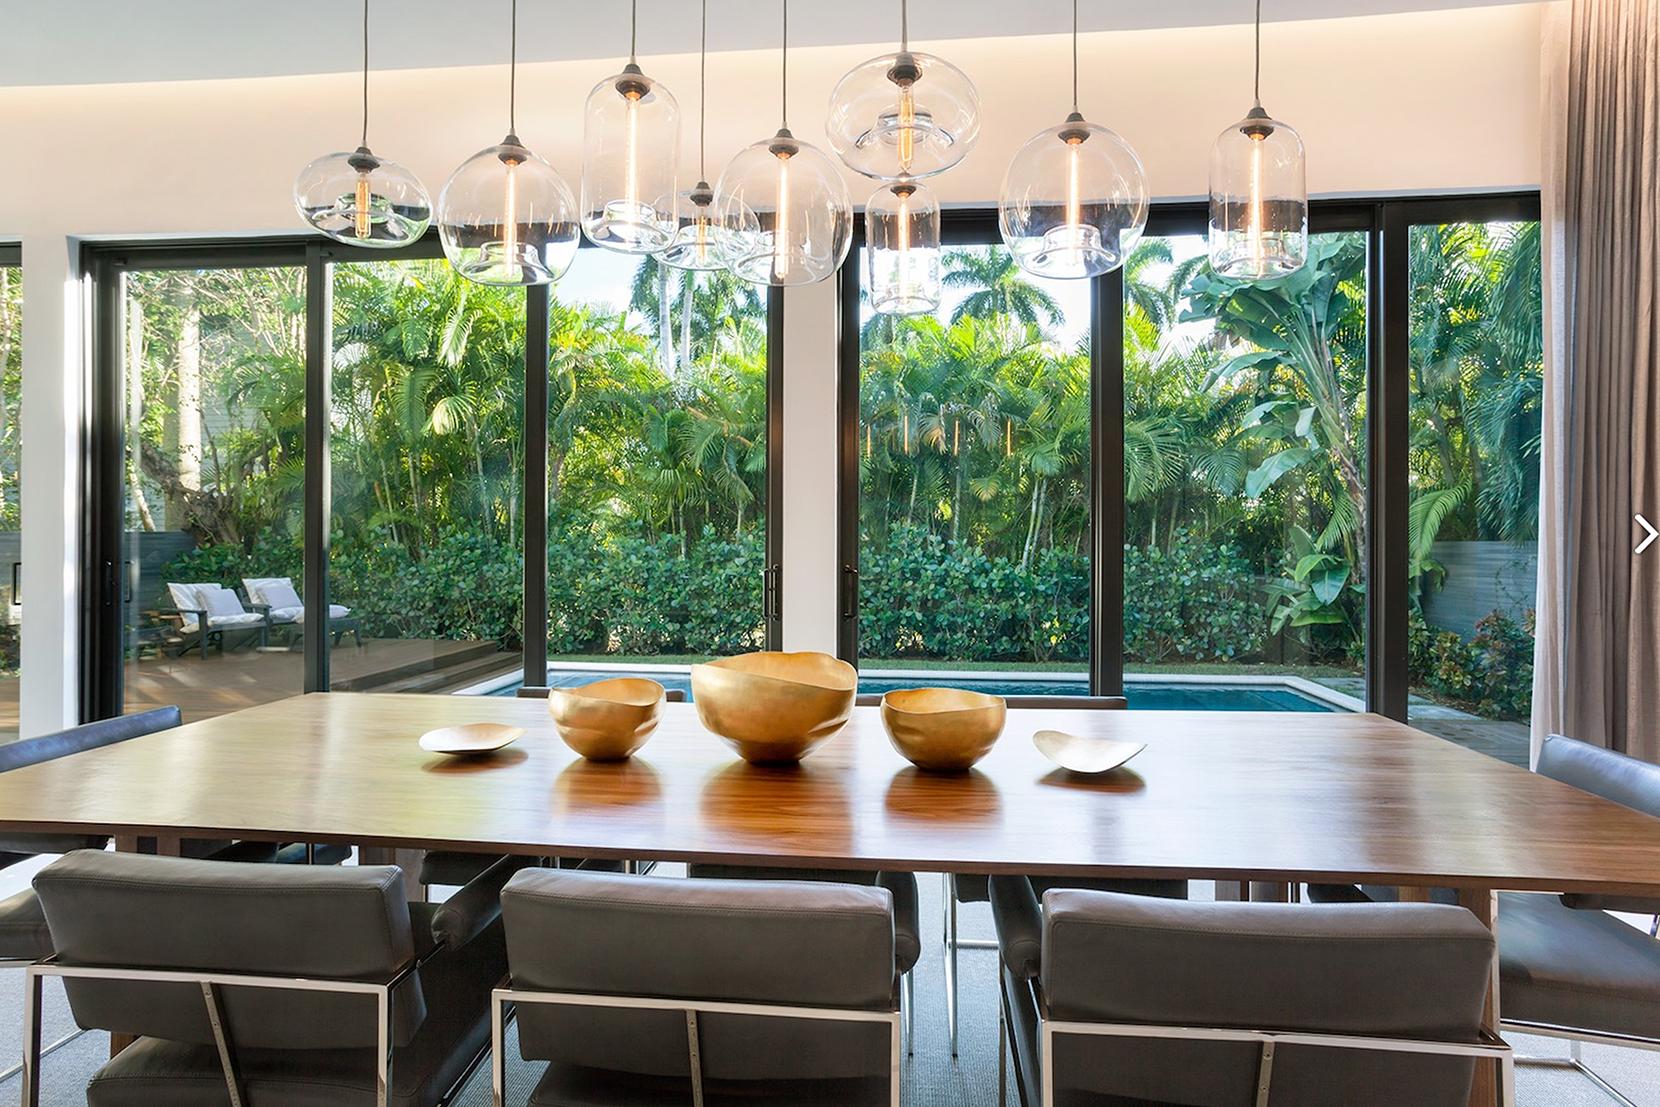 dining room lighting modern. + Read More Dining Room Lighting Modern I